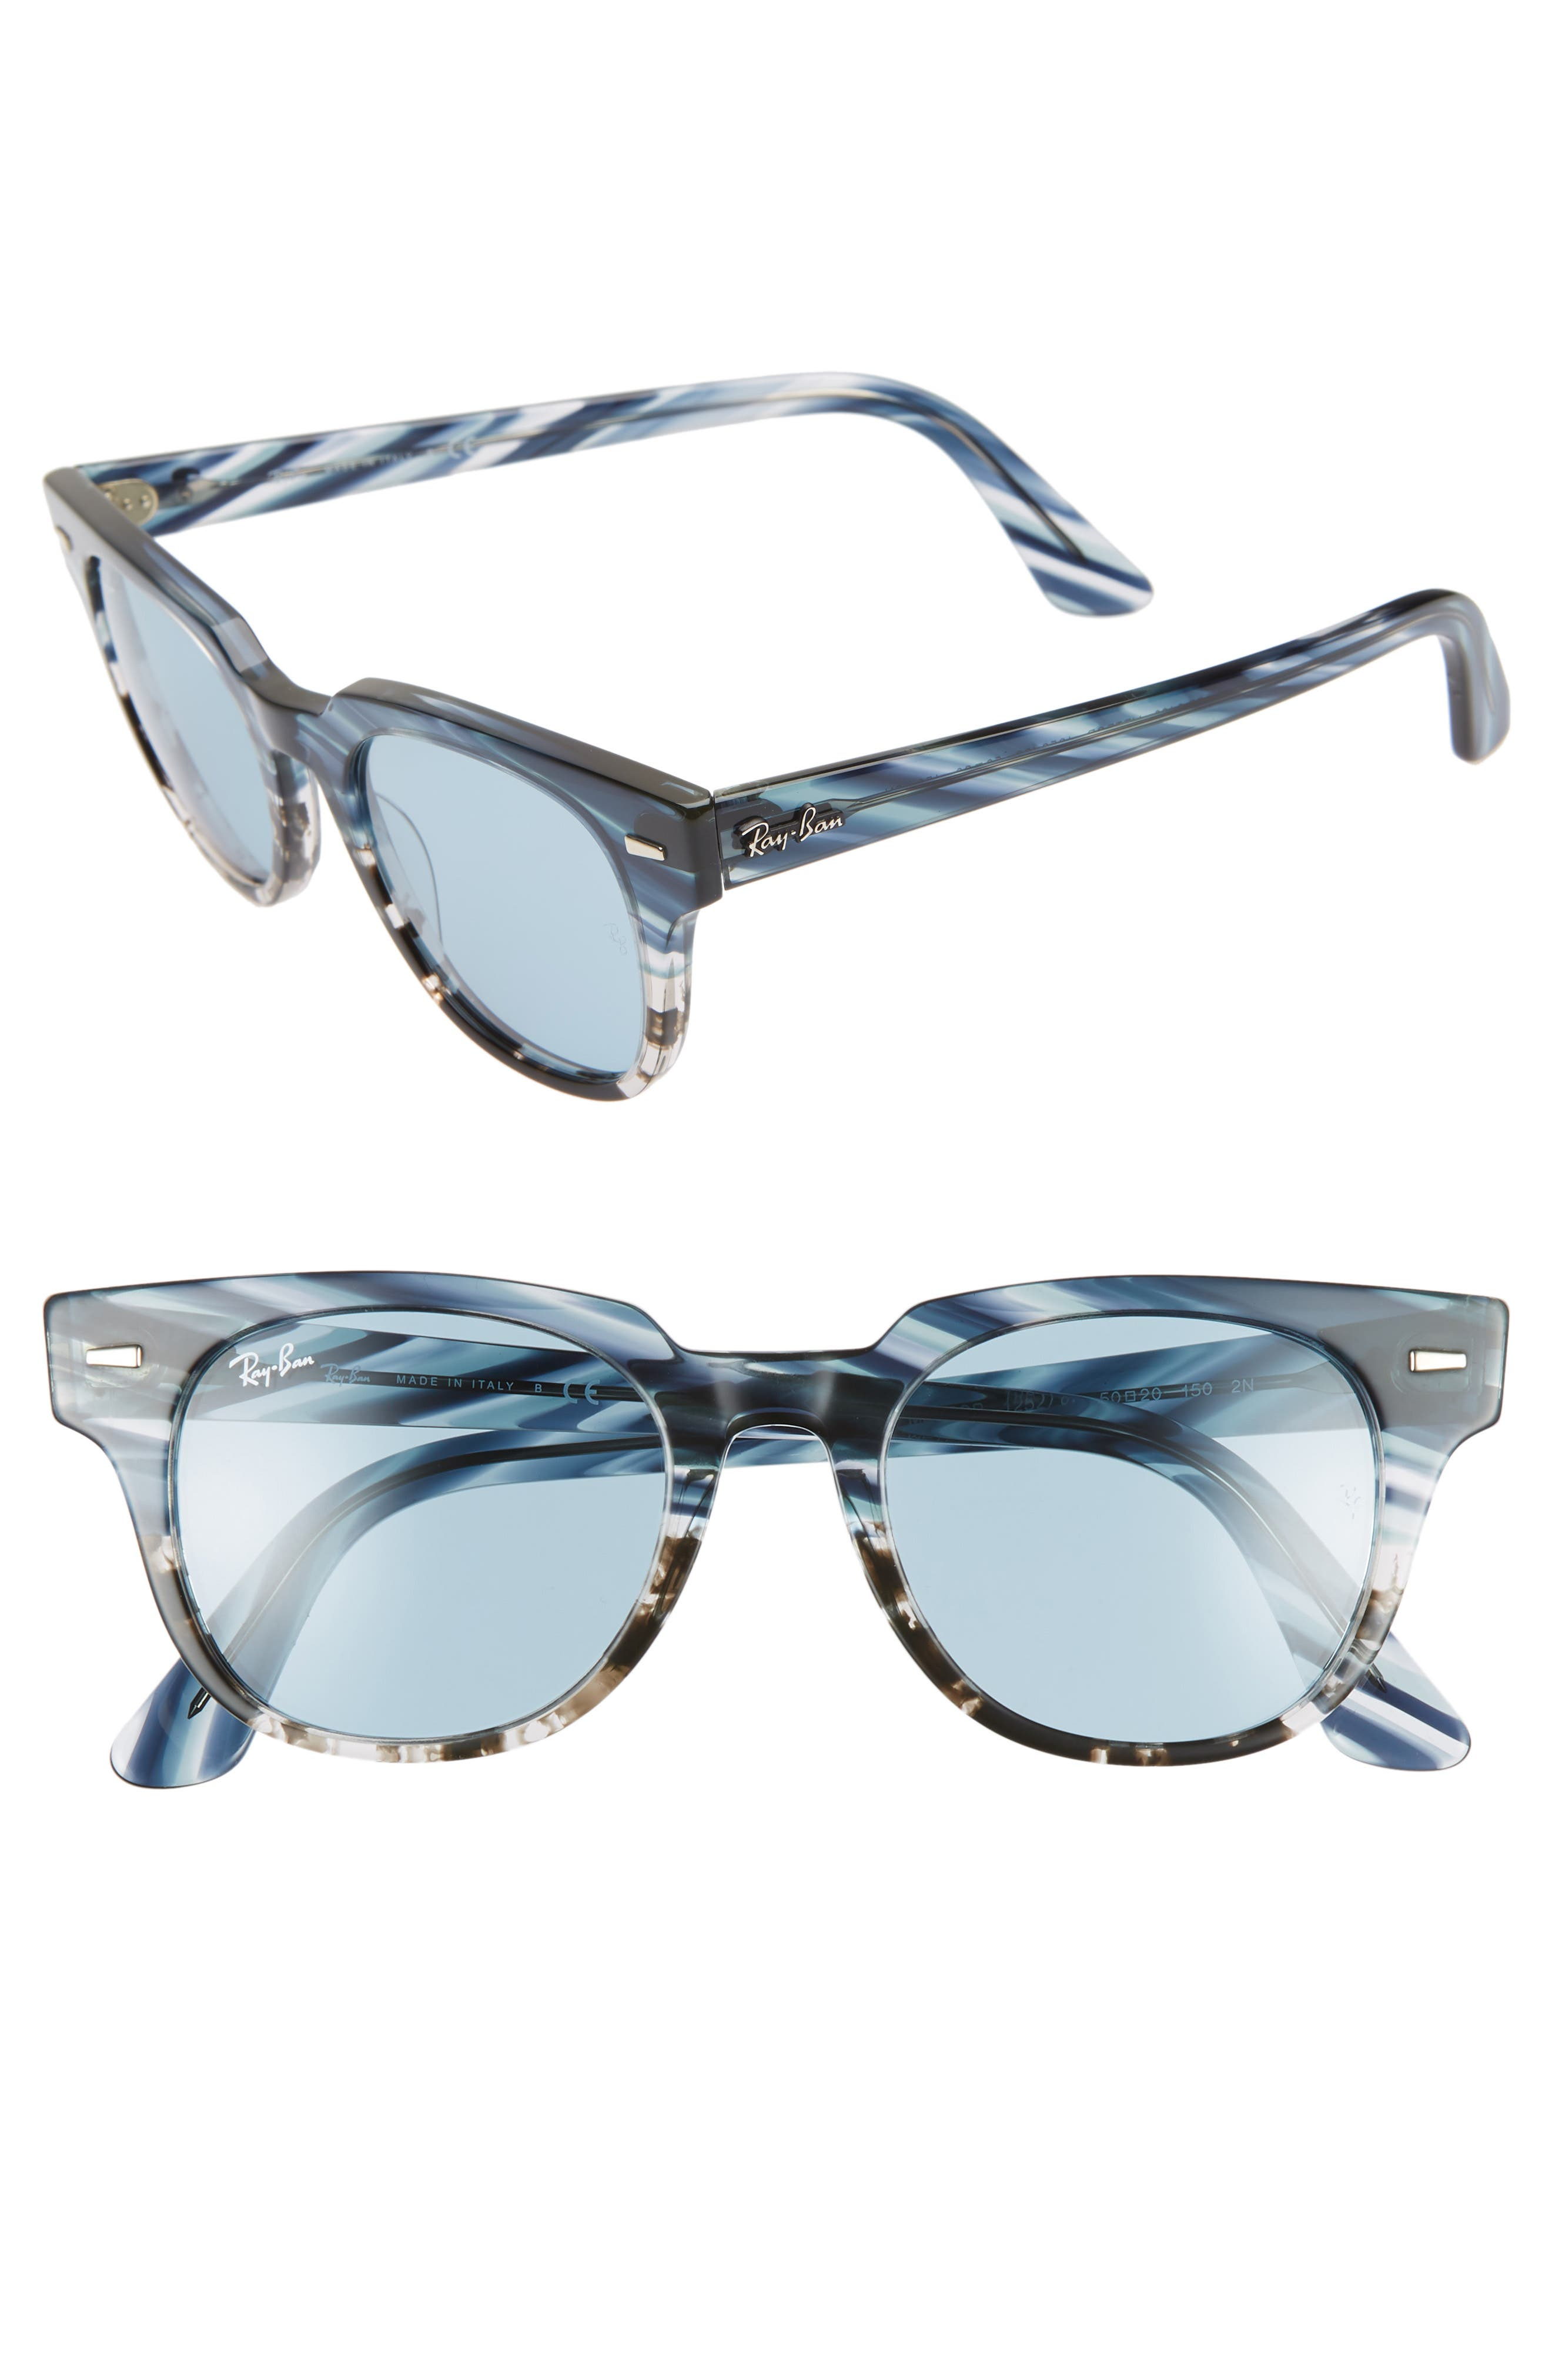 Meteor 50Mm Wayfarer Sunglasses - Blue Grey Solid